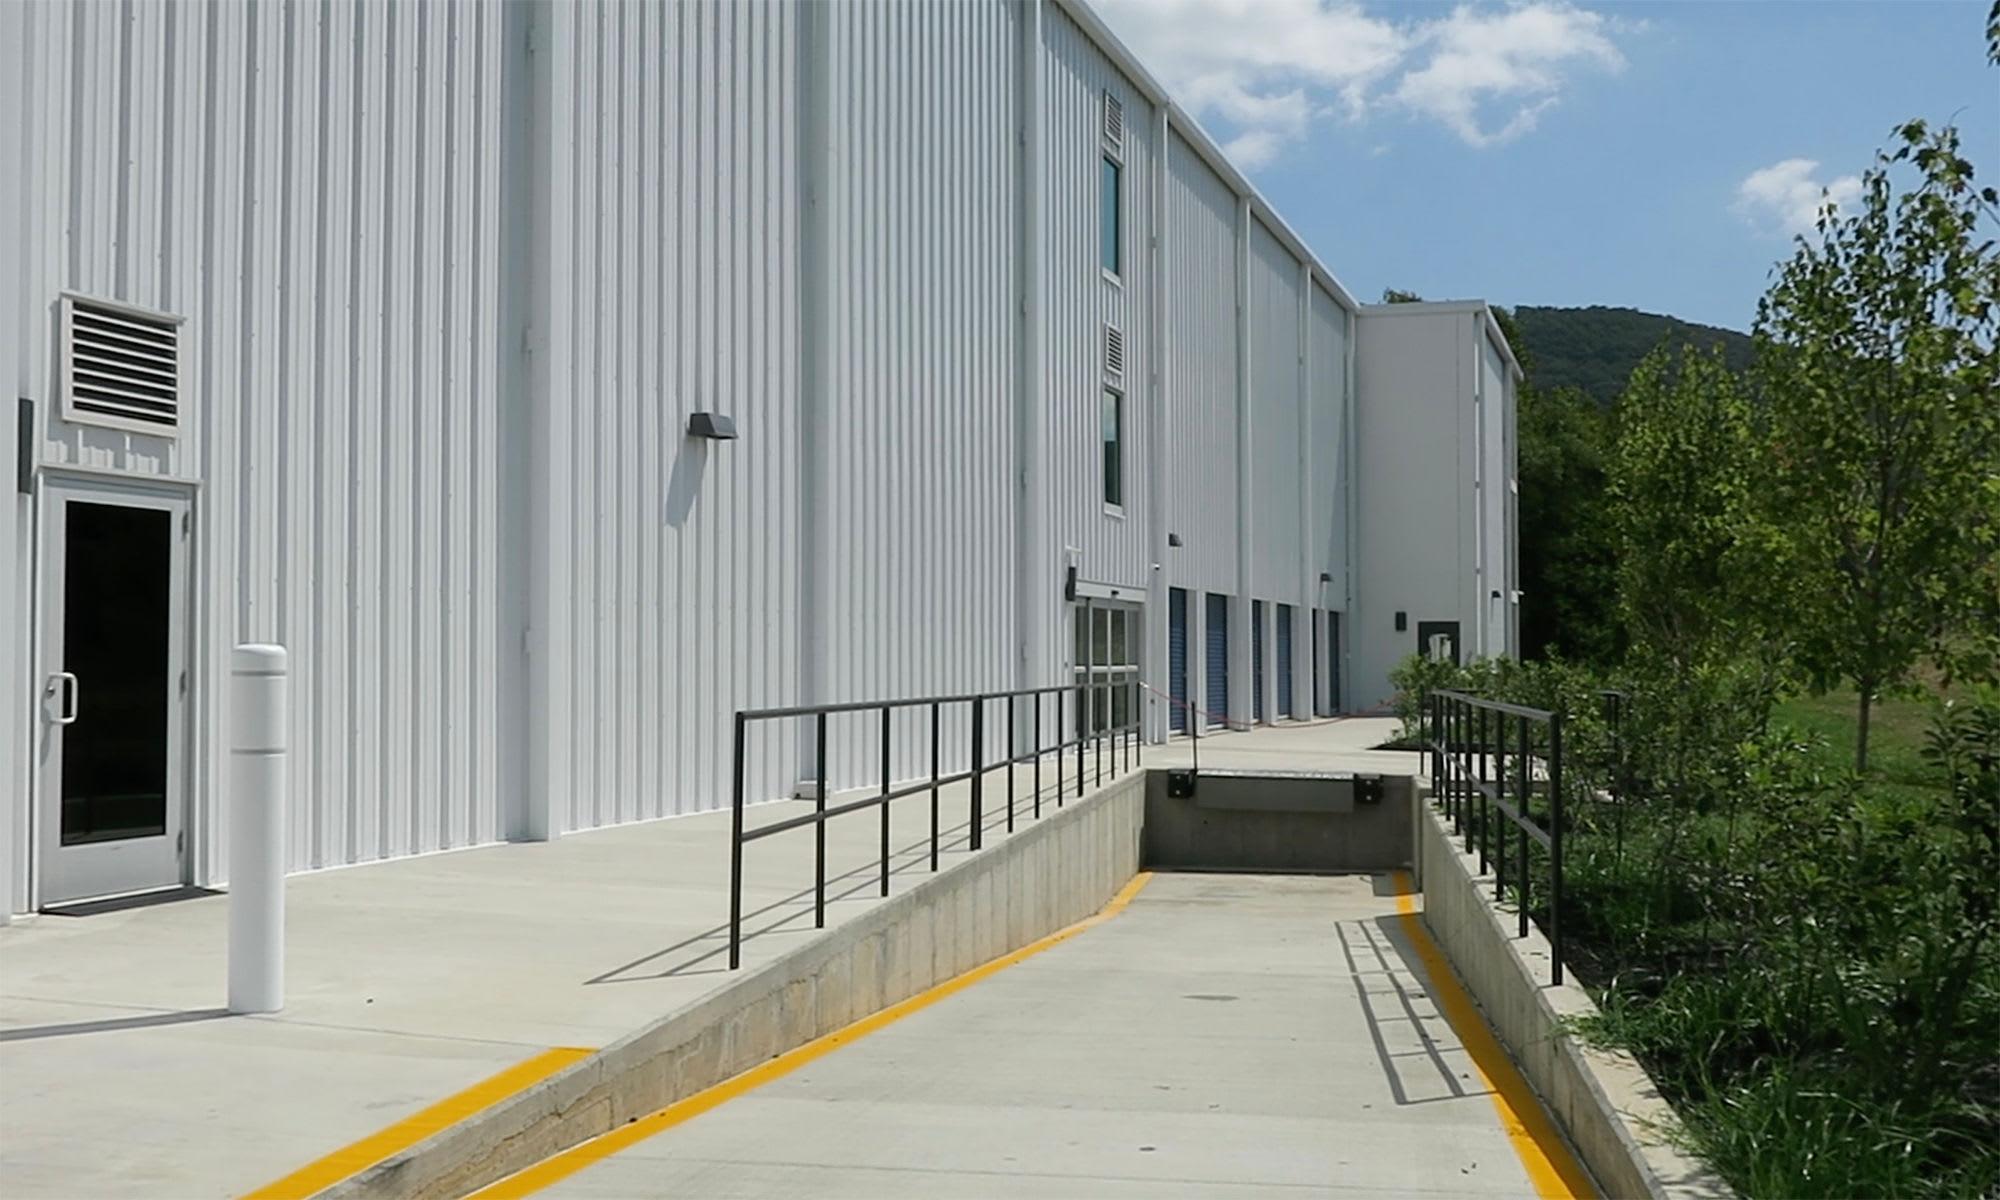 Tractor Trailer Accessible Dock at Virginia Varsity Storage in Roanoke, Virginia is located